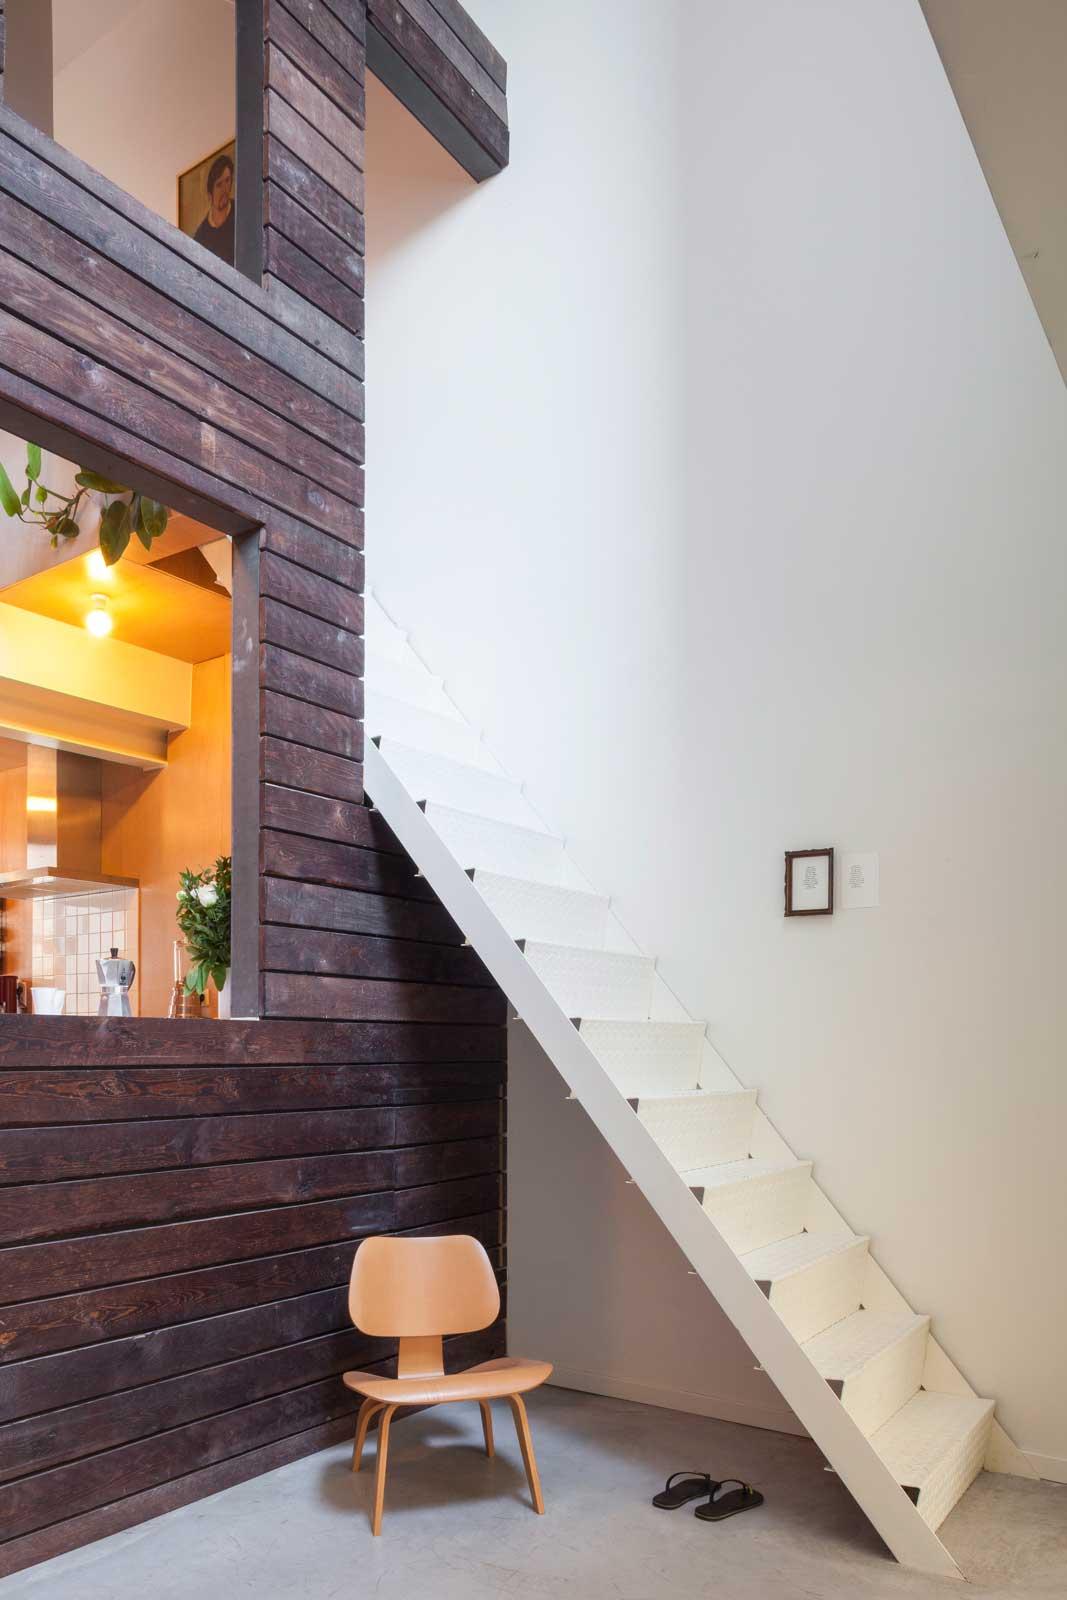 Atelier Vens Vanbelle | Yellowtrace